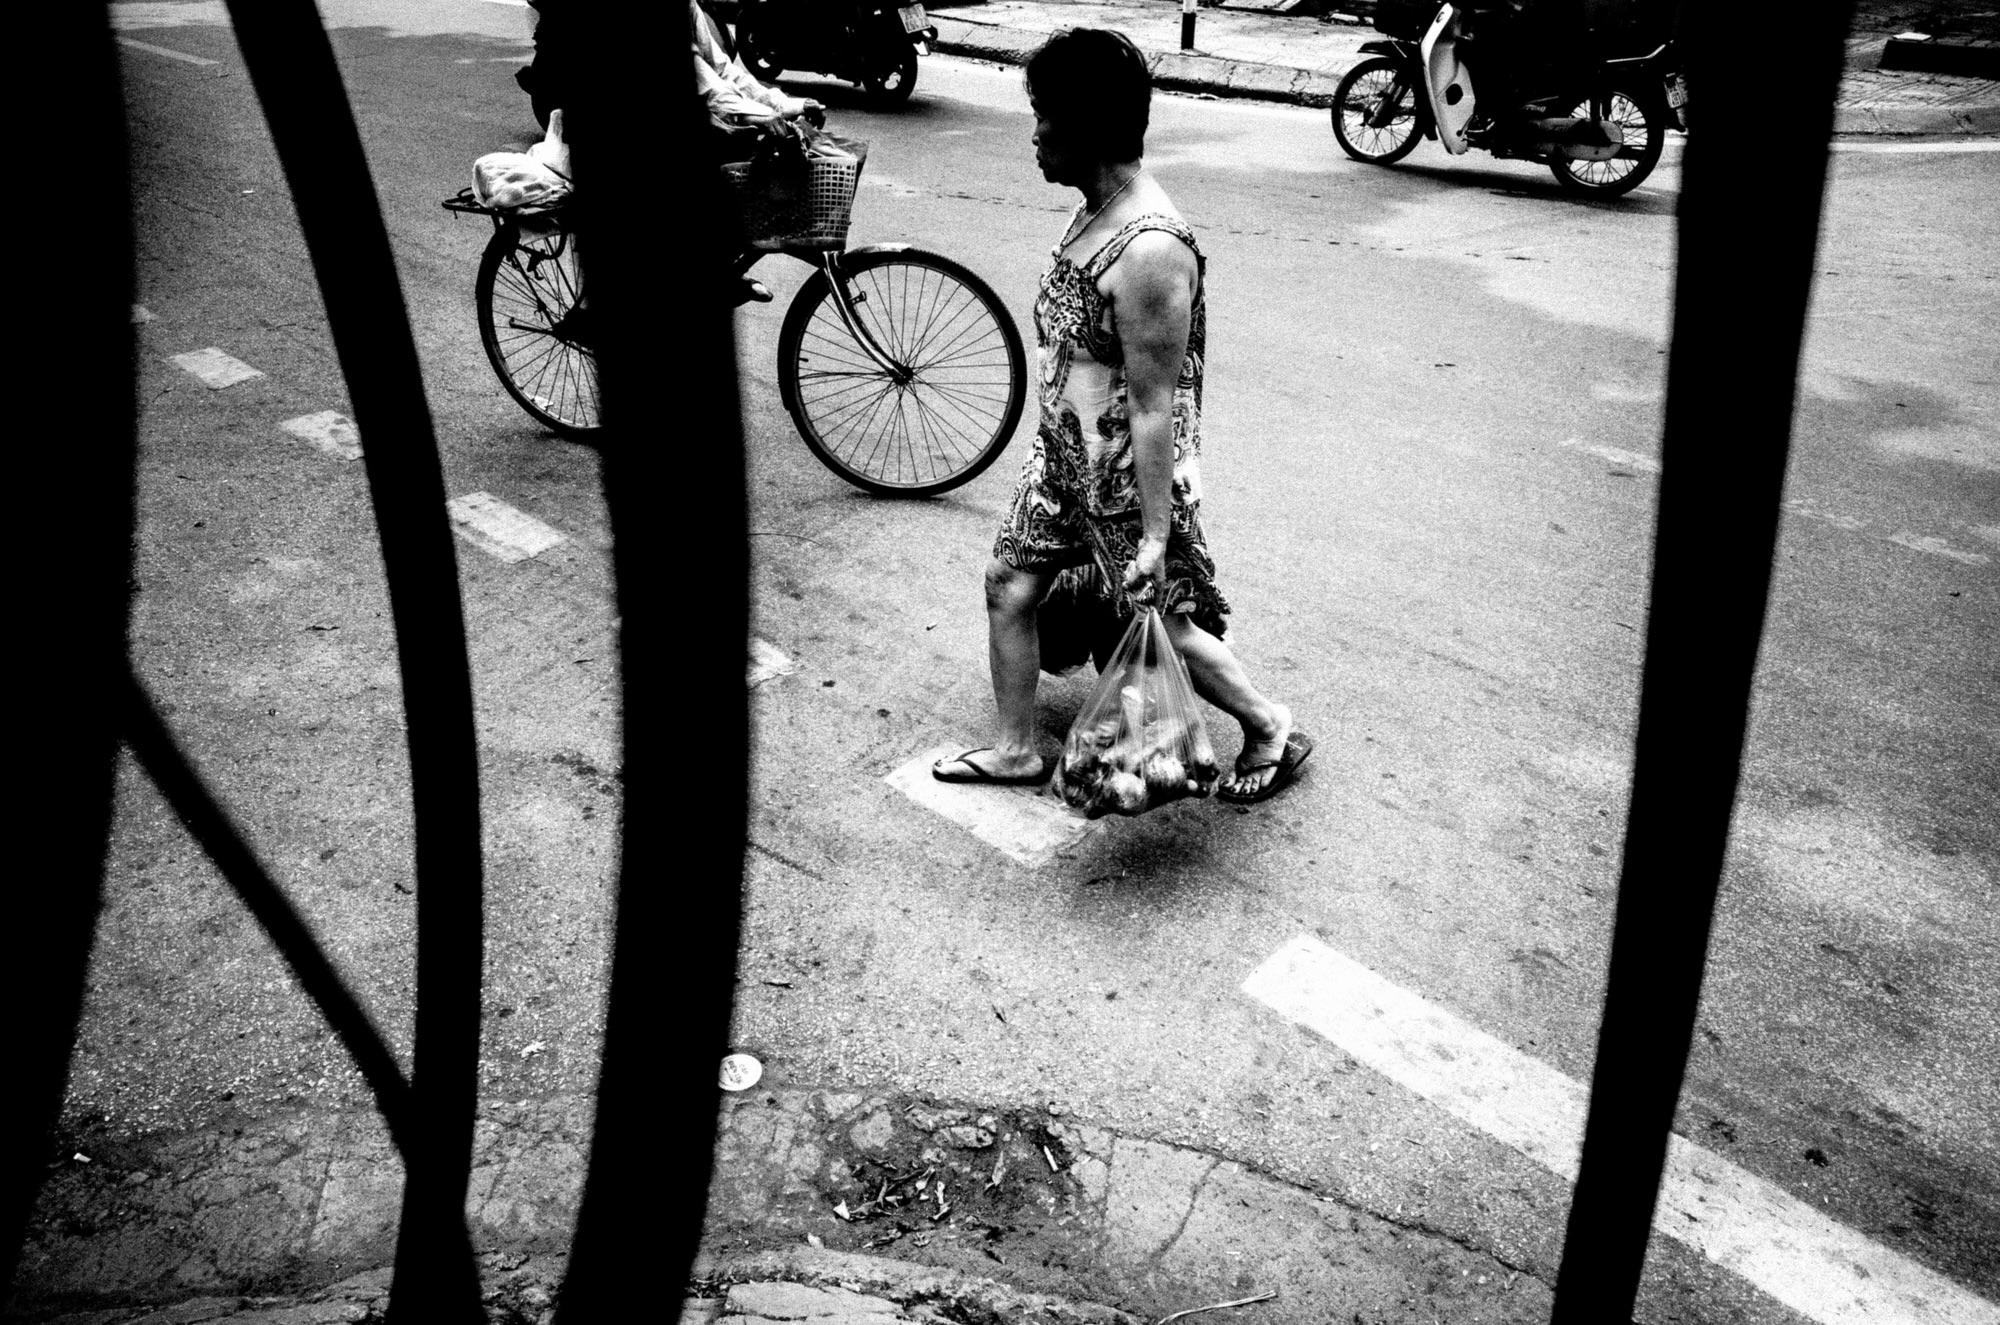 eric kim photography street photography-0013270